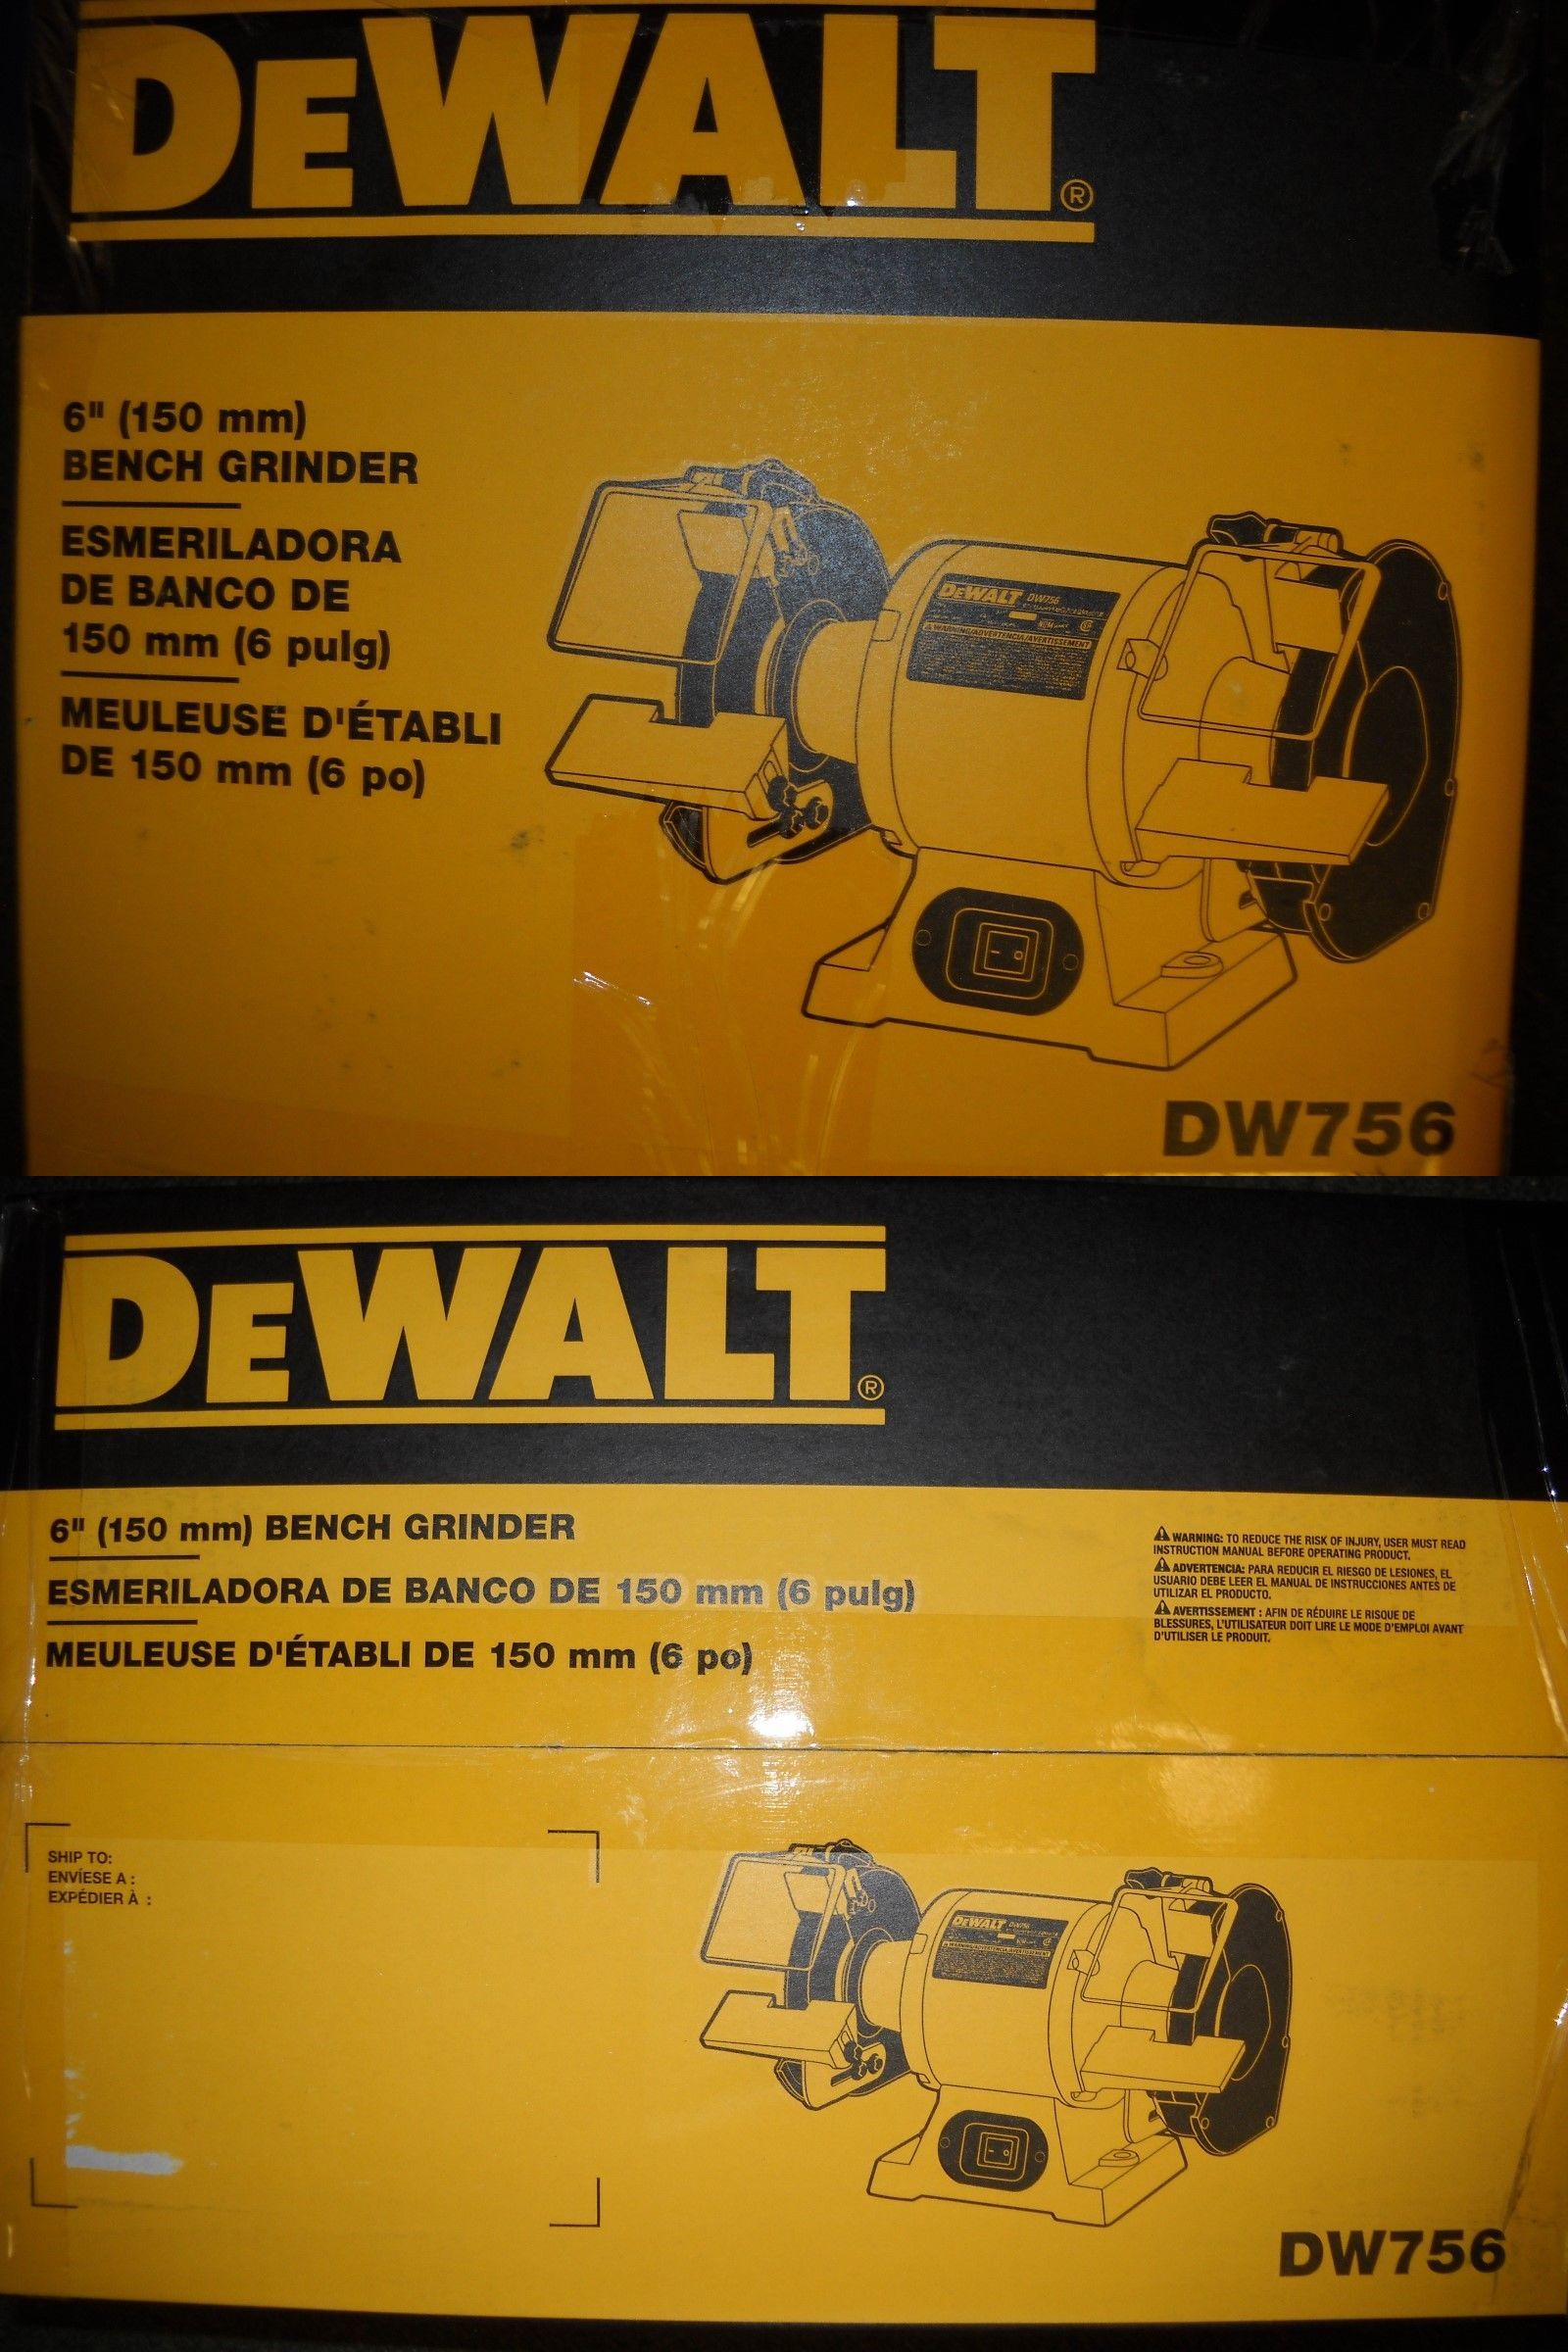 Dewalt 6 inch bench grinder | dw756 | ereplacementparts. Com.